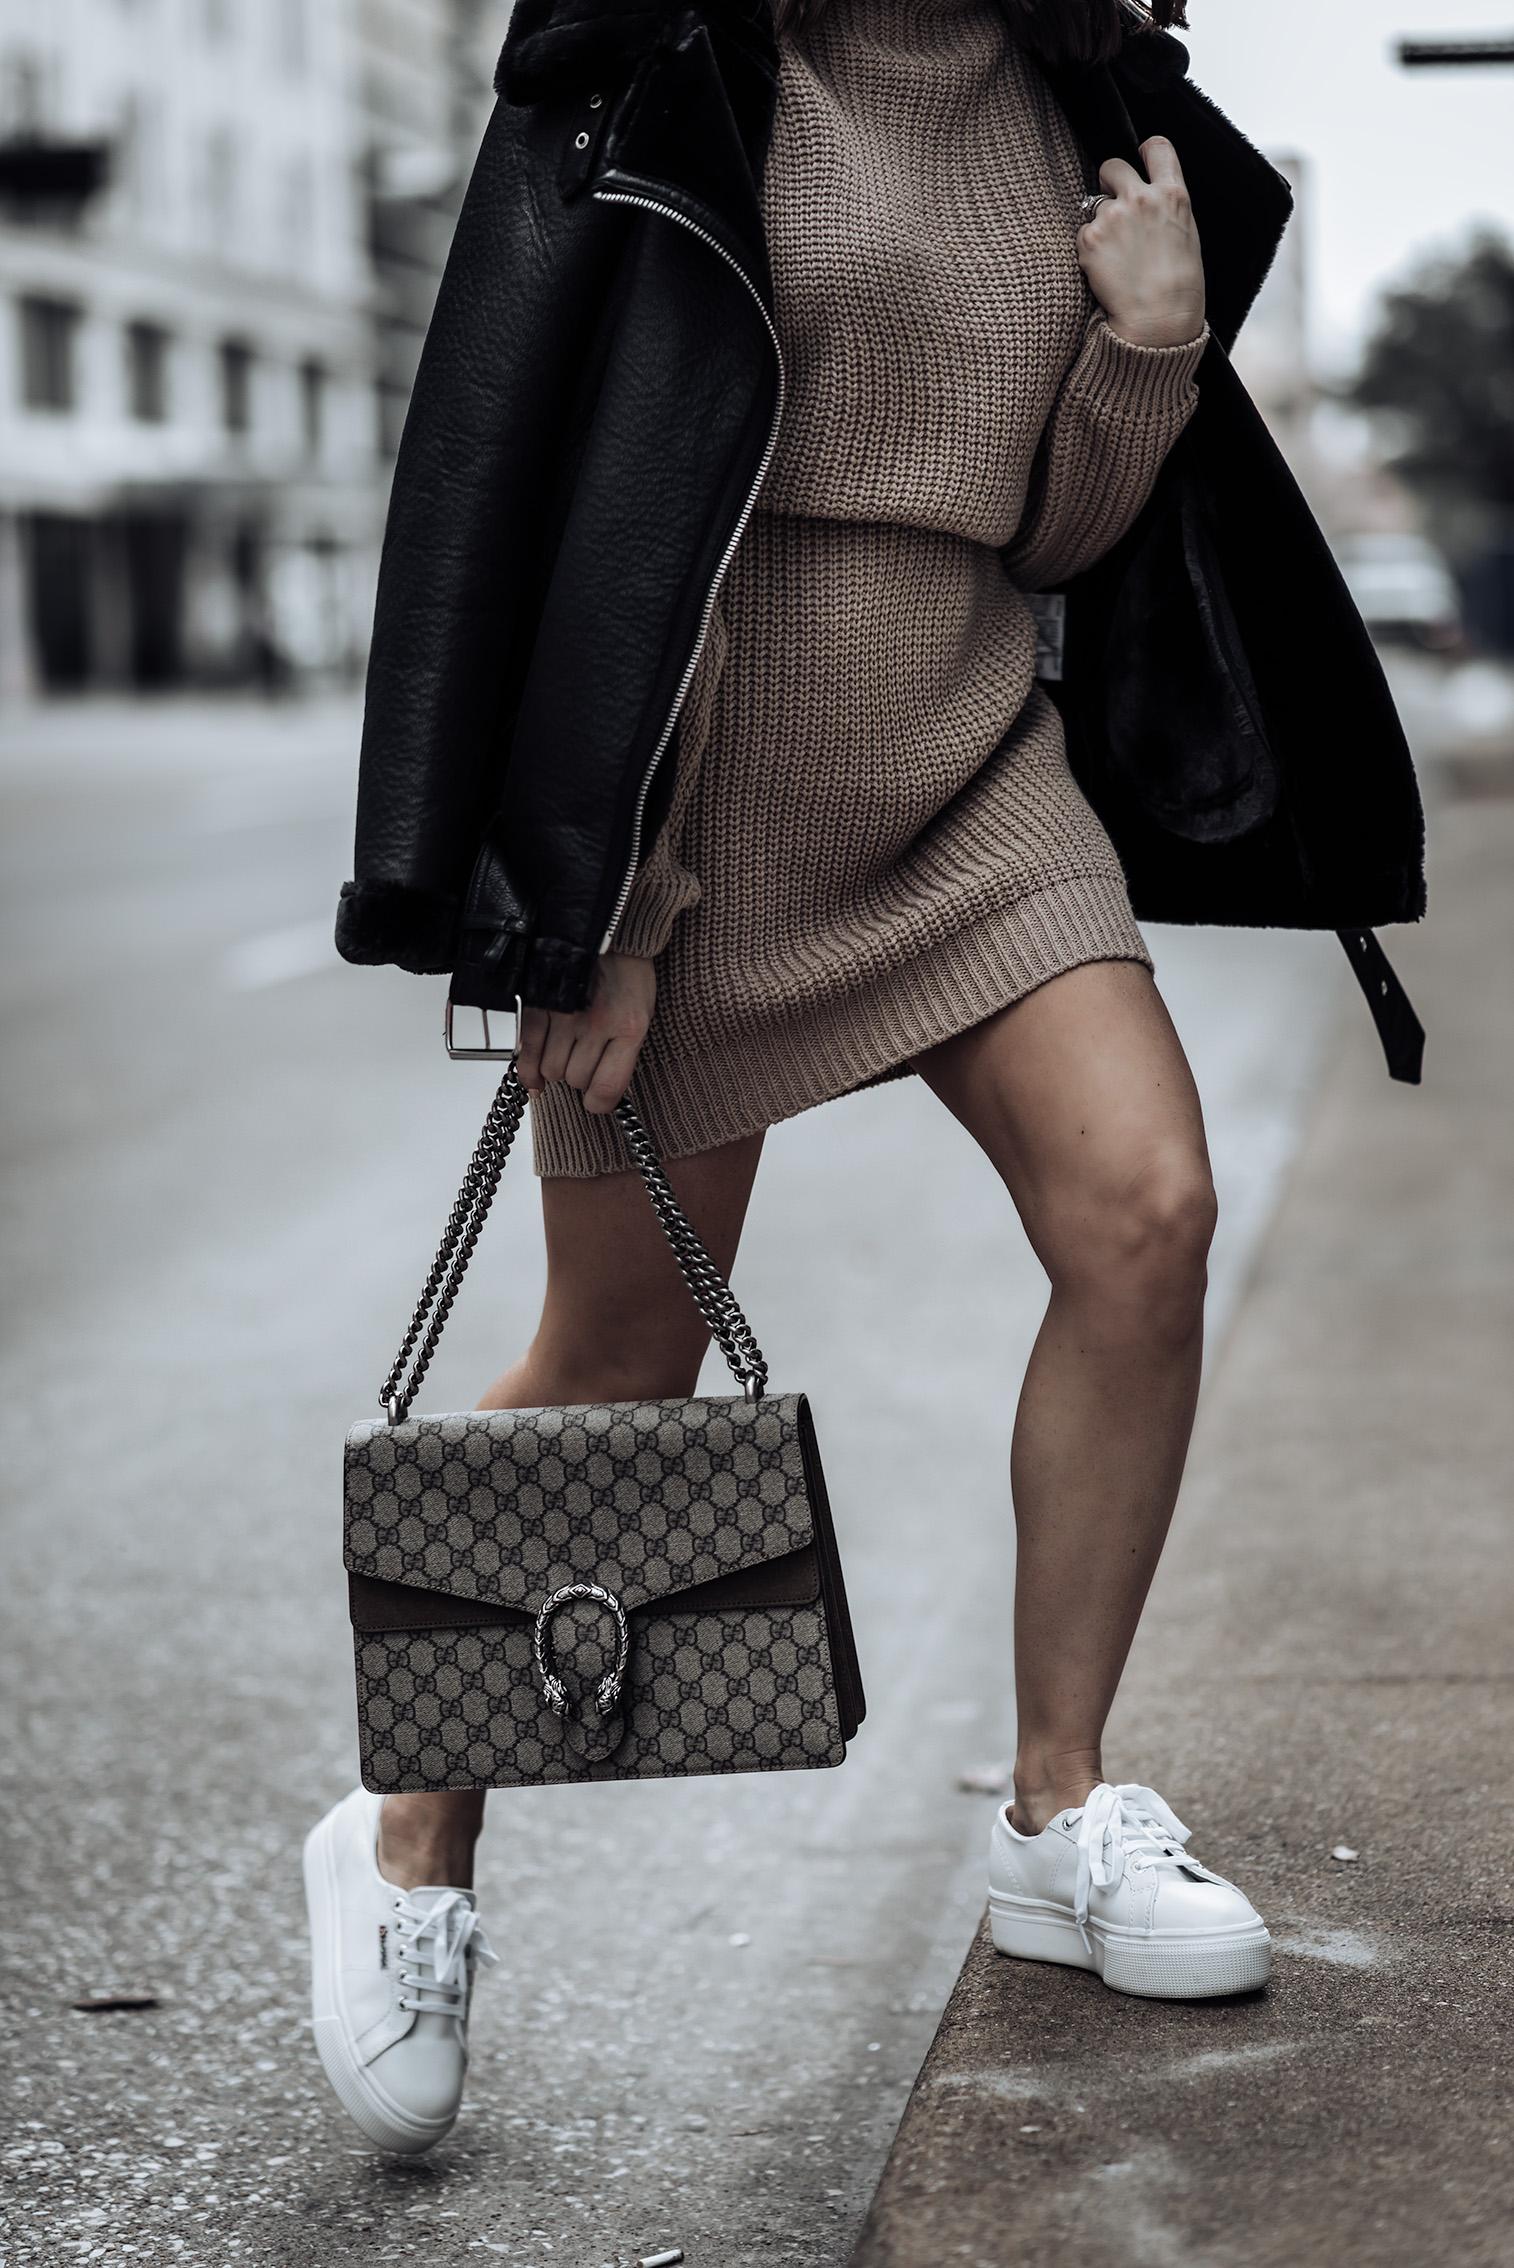 Transitioning into spring |Iffy Stone Oversized Cable Knit Sweater Dress | 2790 Platform Sneakers | Dionysus GG Bag | Oversized Biker Jacket | #sweaterdresss #liketkit #rewardstyle #streetstyle2018